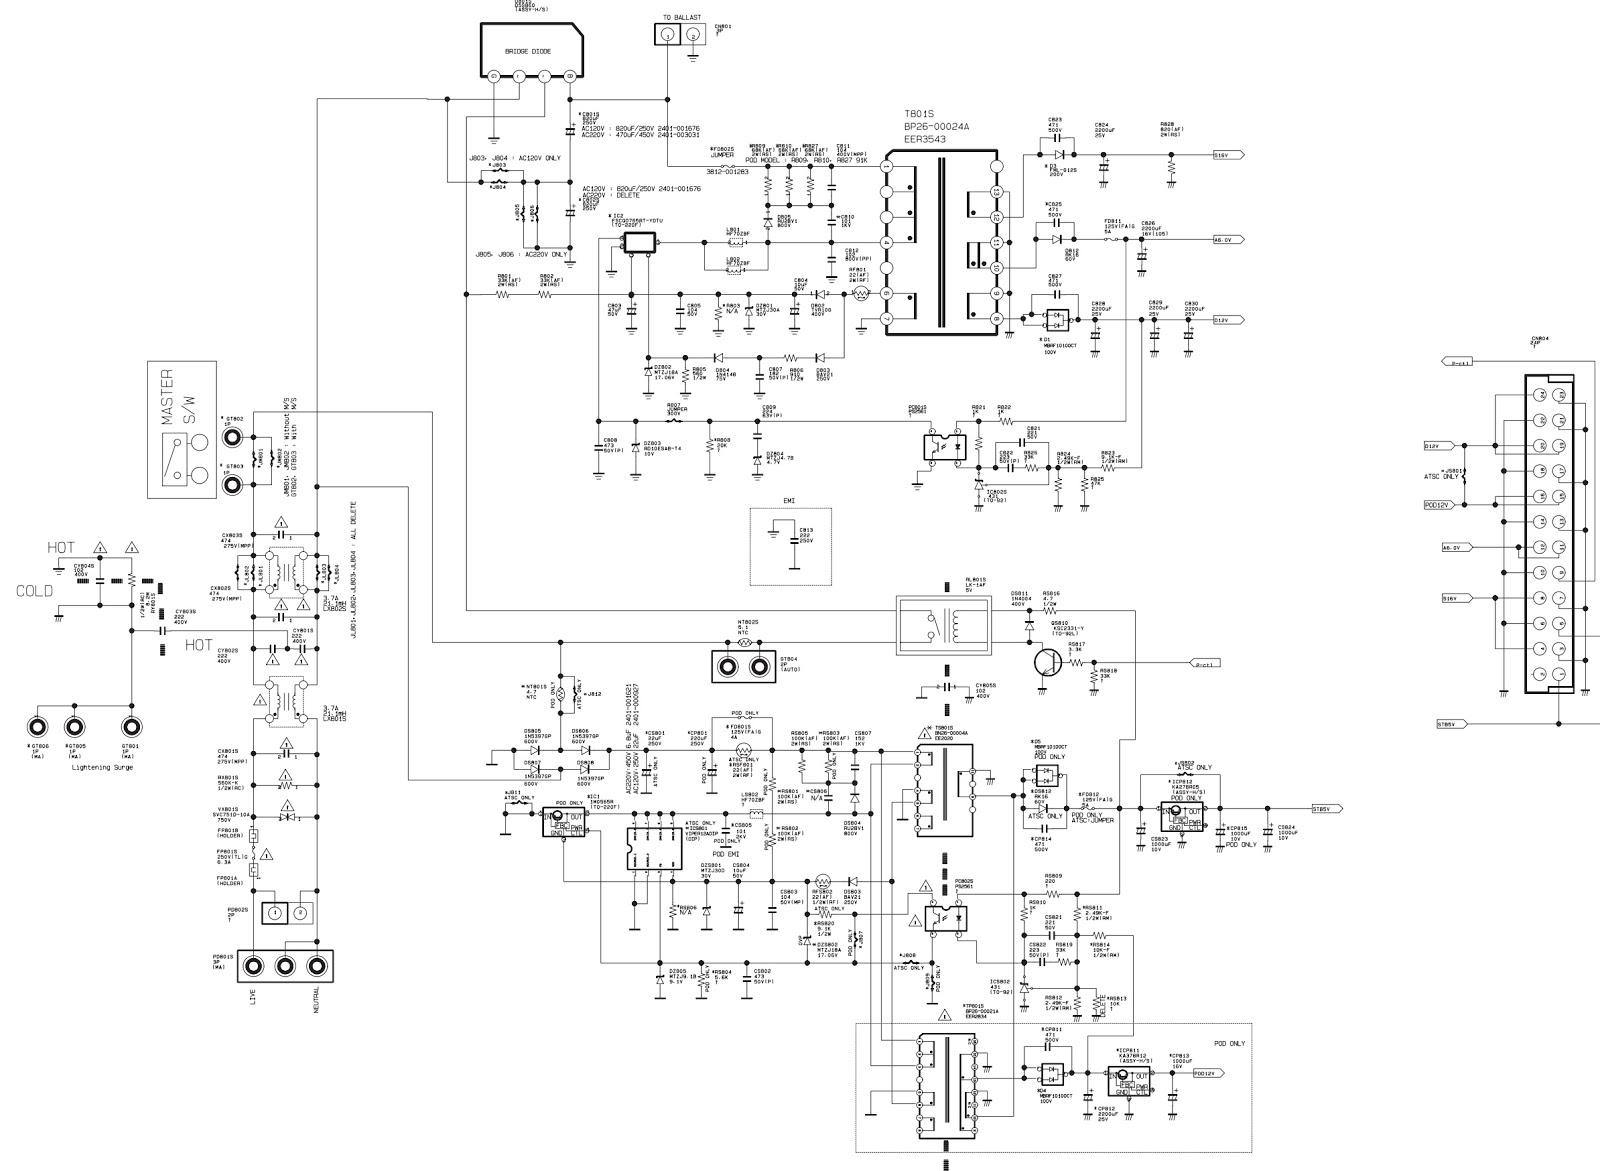 medium resolution of samsung dlp wiring diagram wiring diagram info samsung dlp wiring diagram